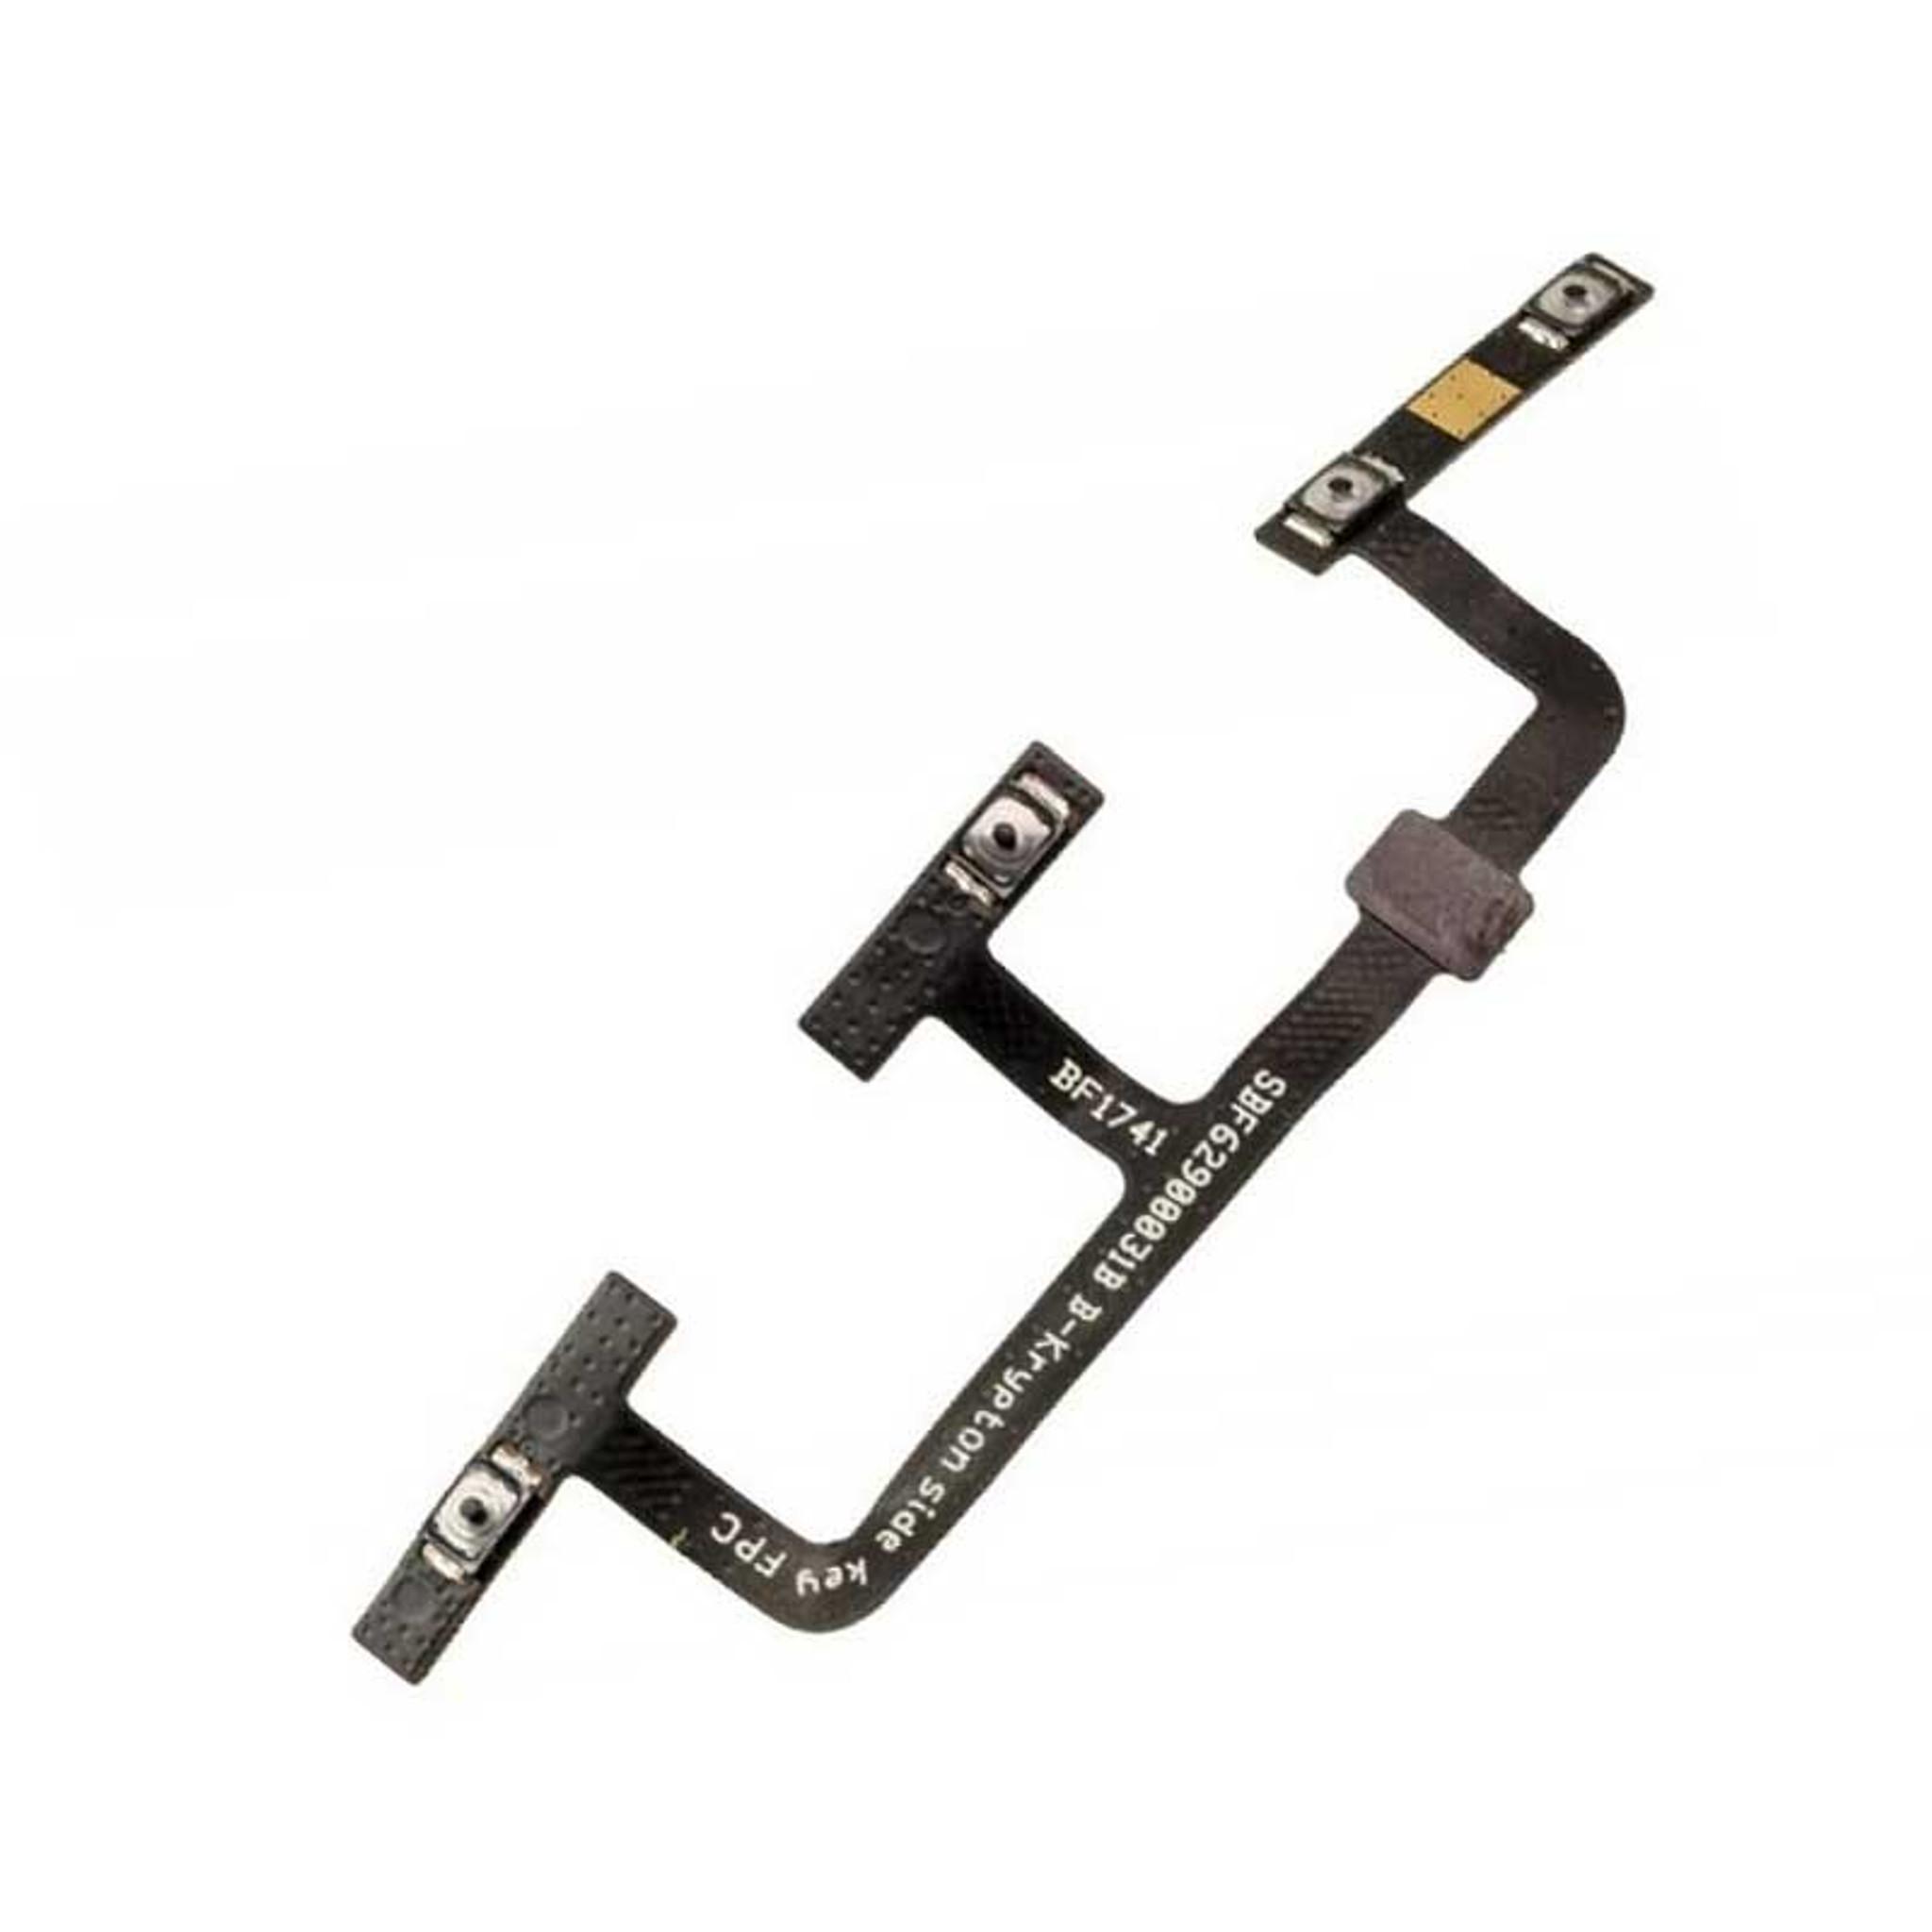 BlackBerry Motion Side Key Flex Cable